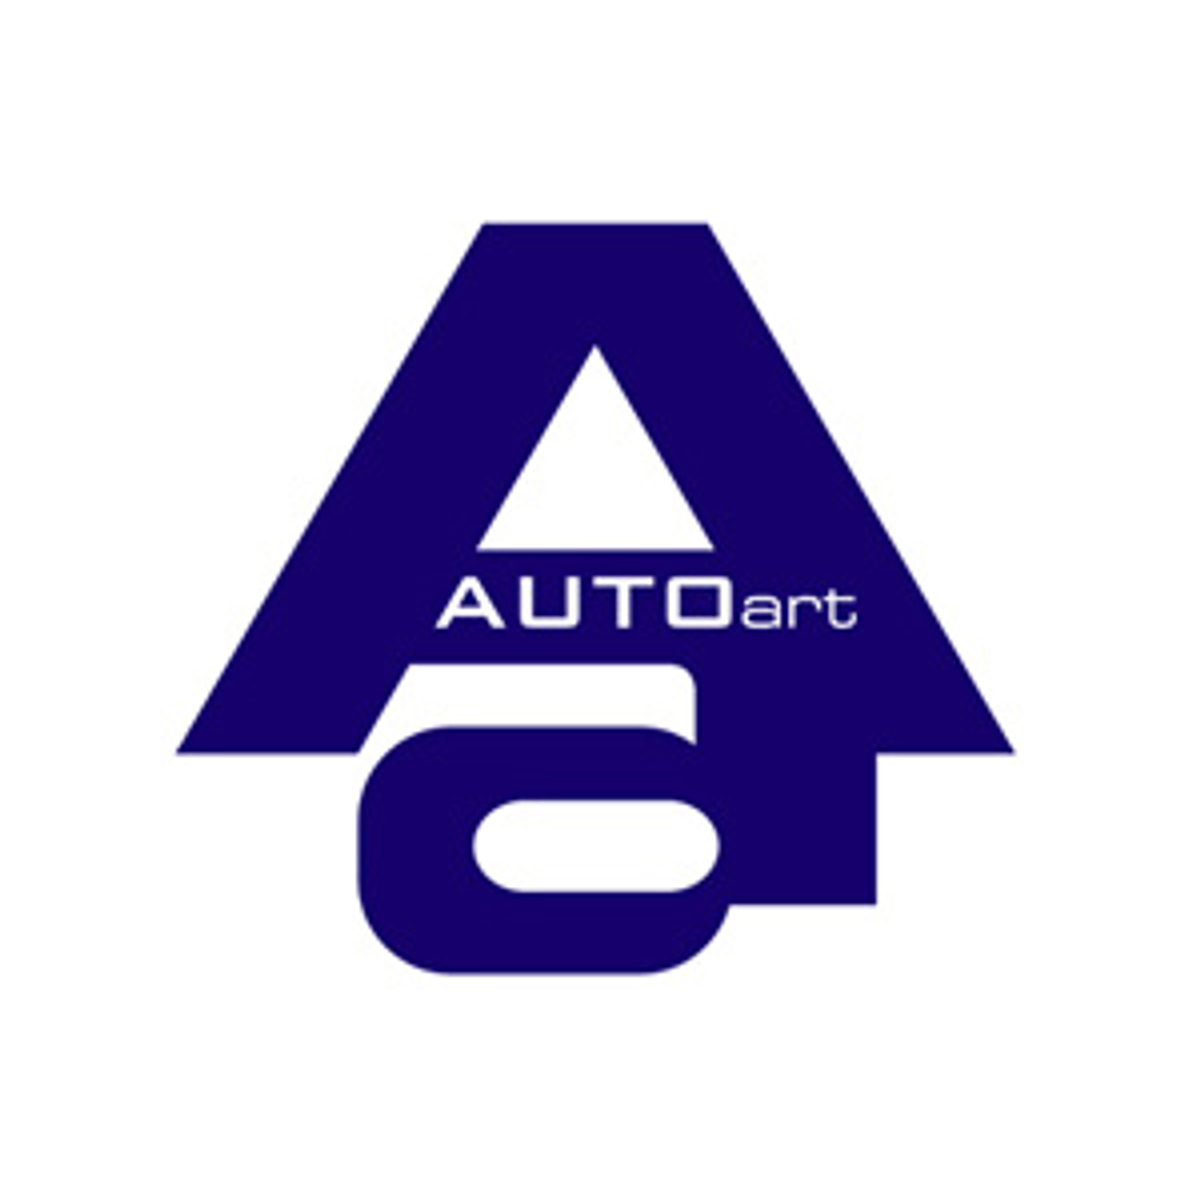 AUTOart logo